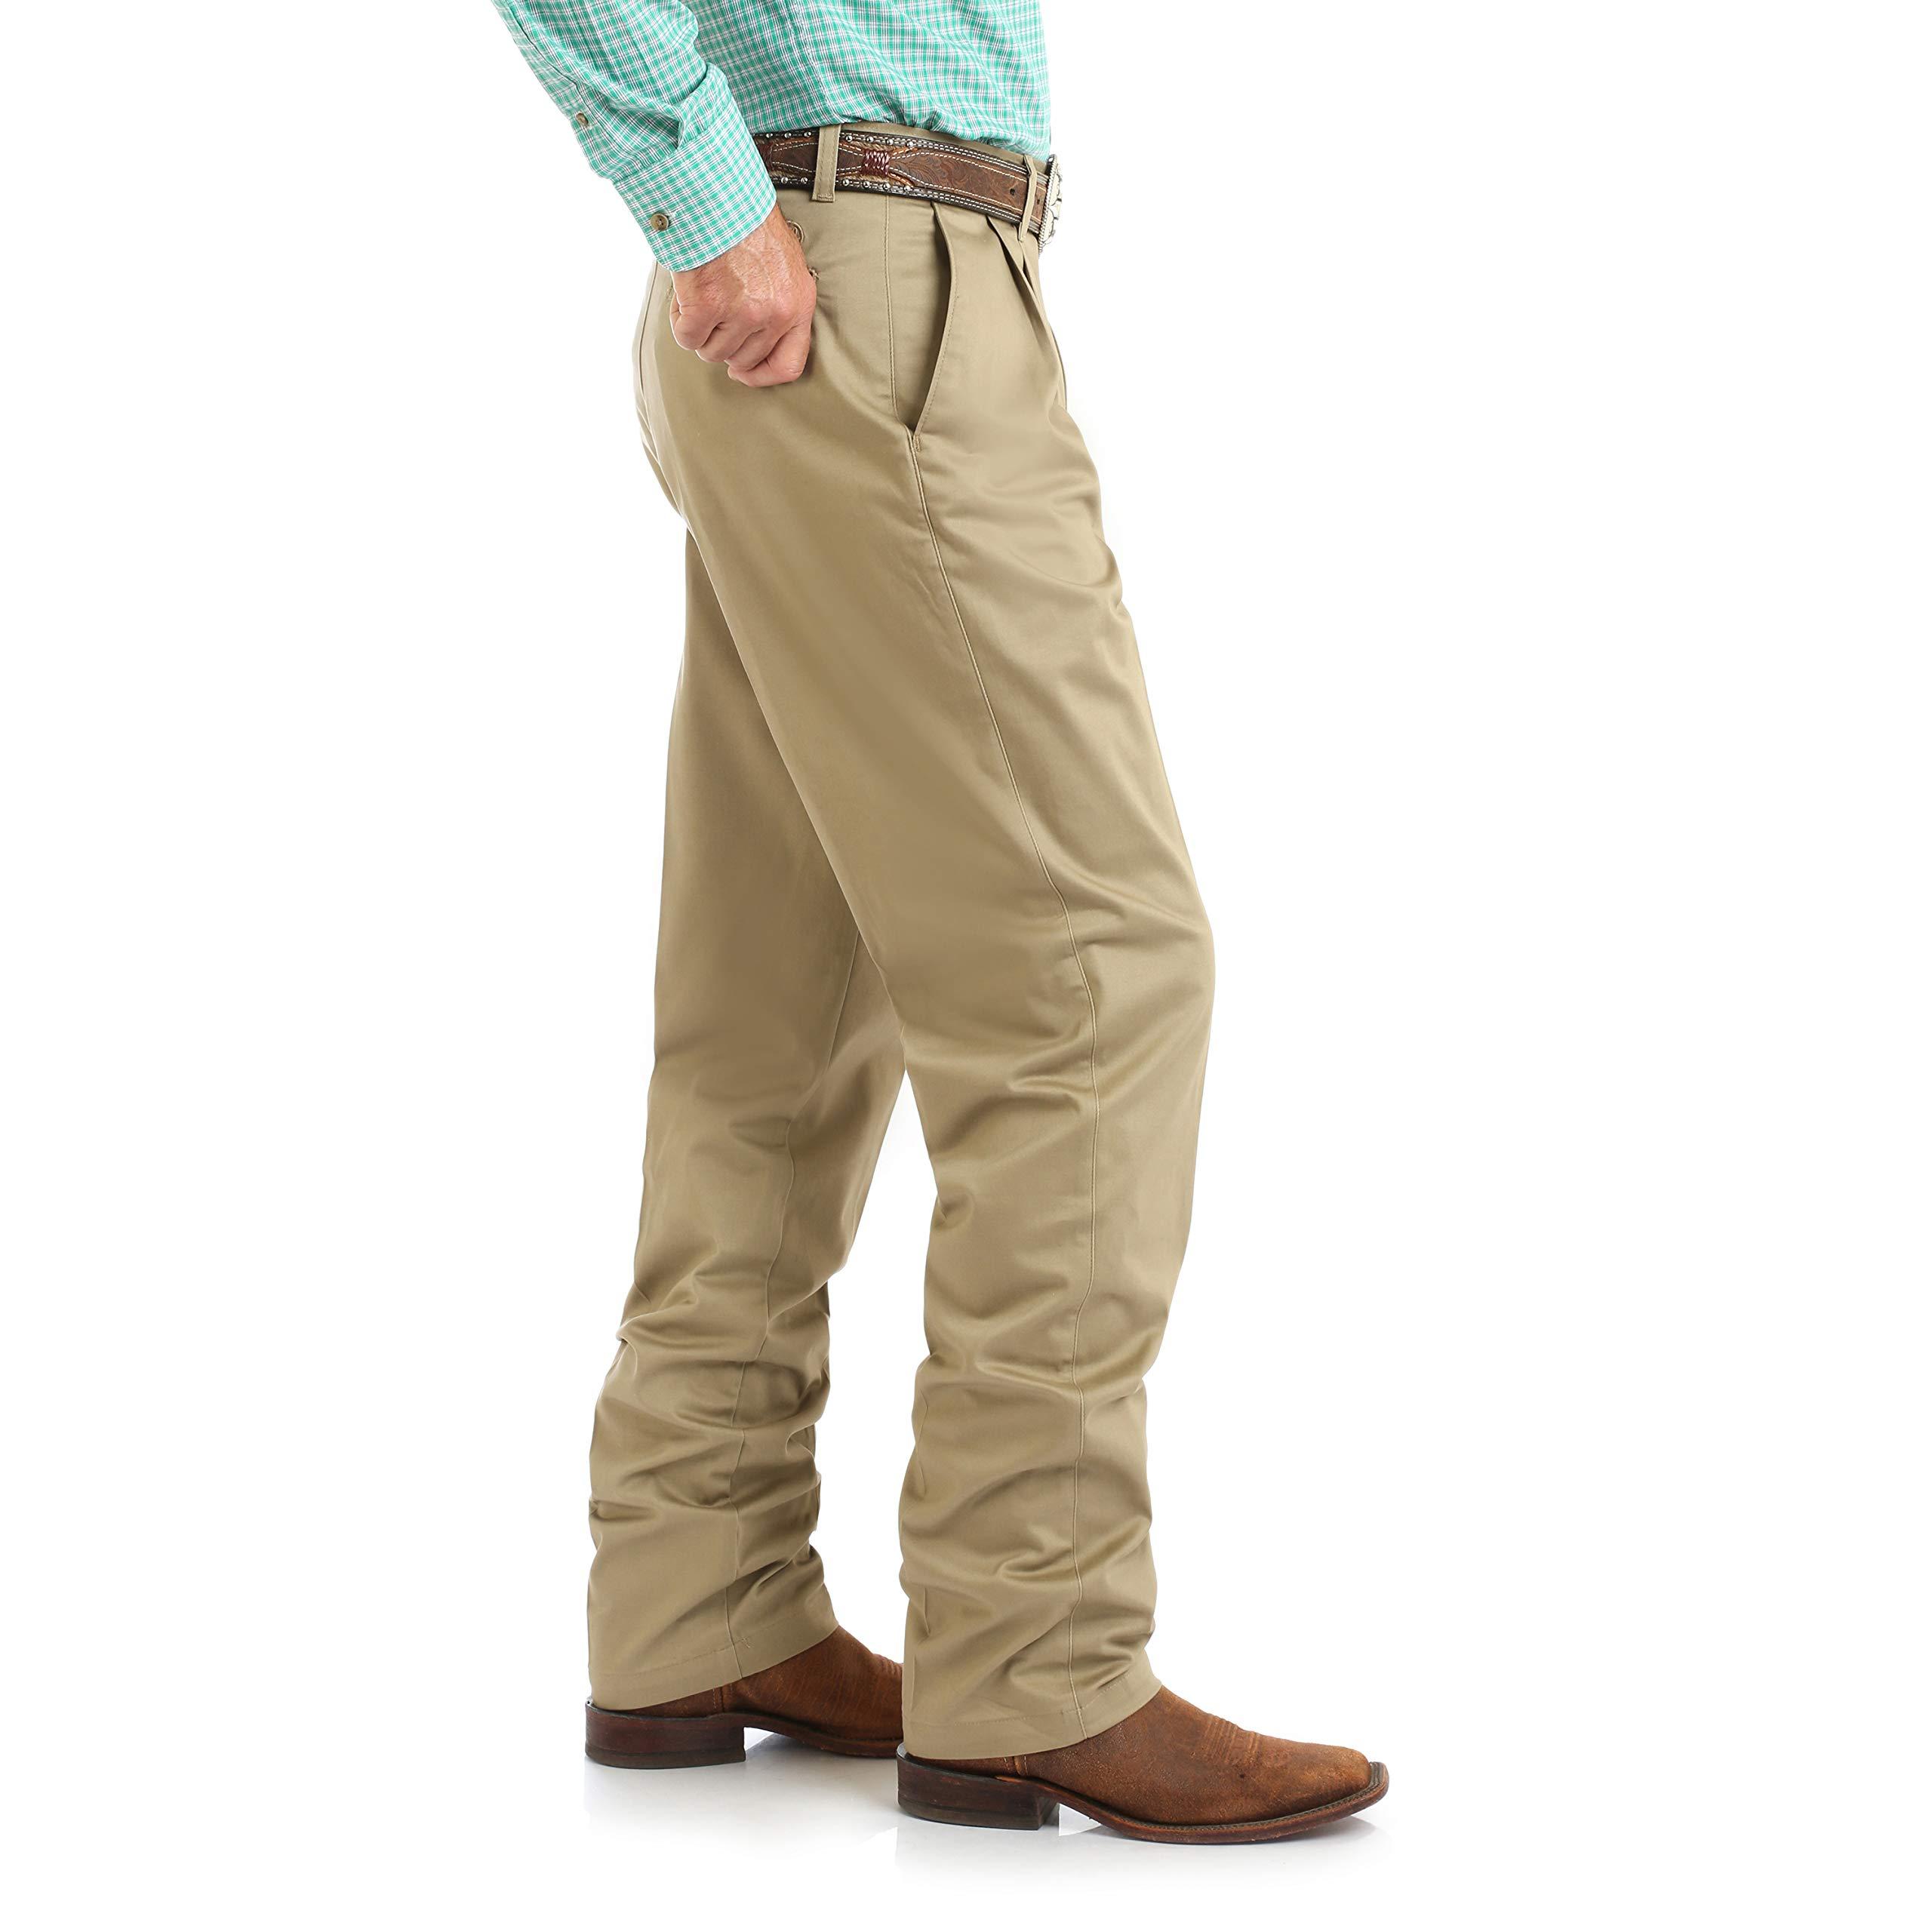 JiJingHeWang Balance Mens Casual Short Trouser